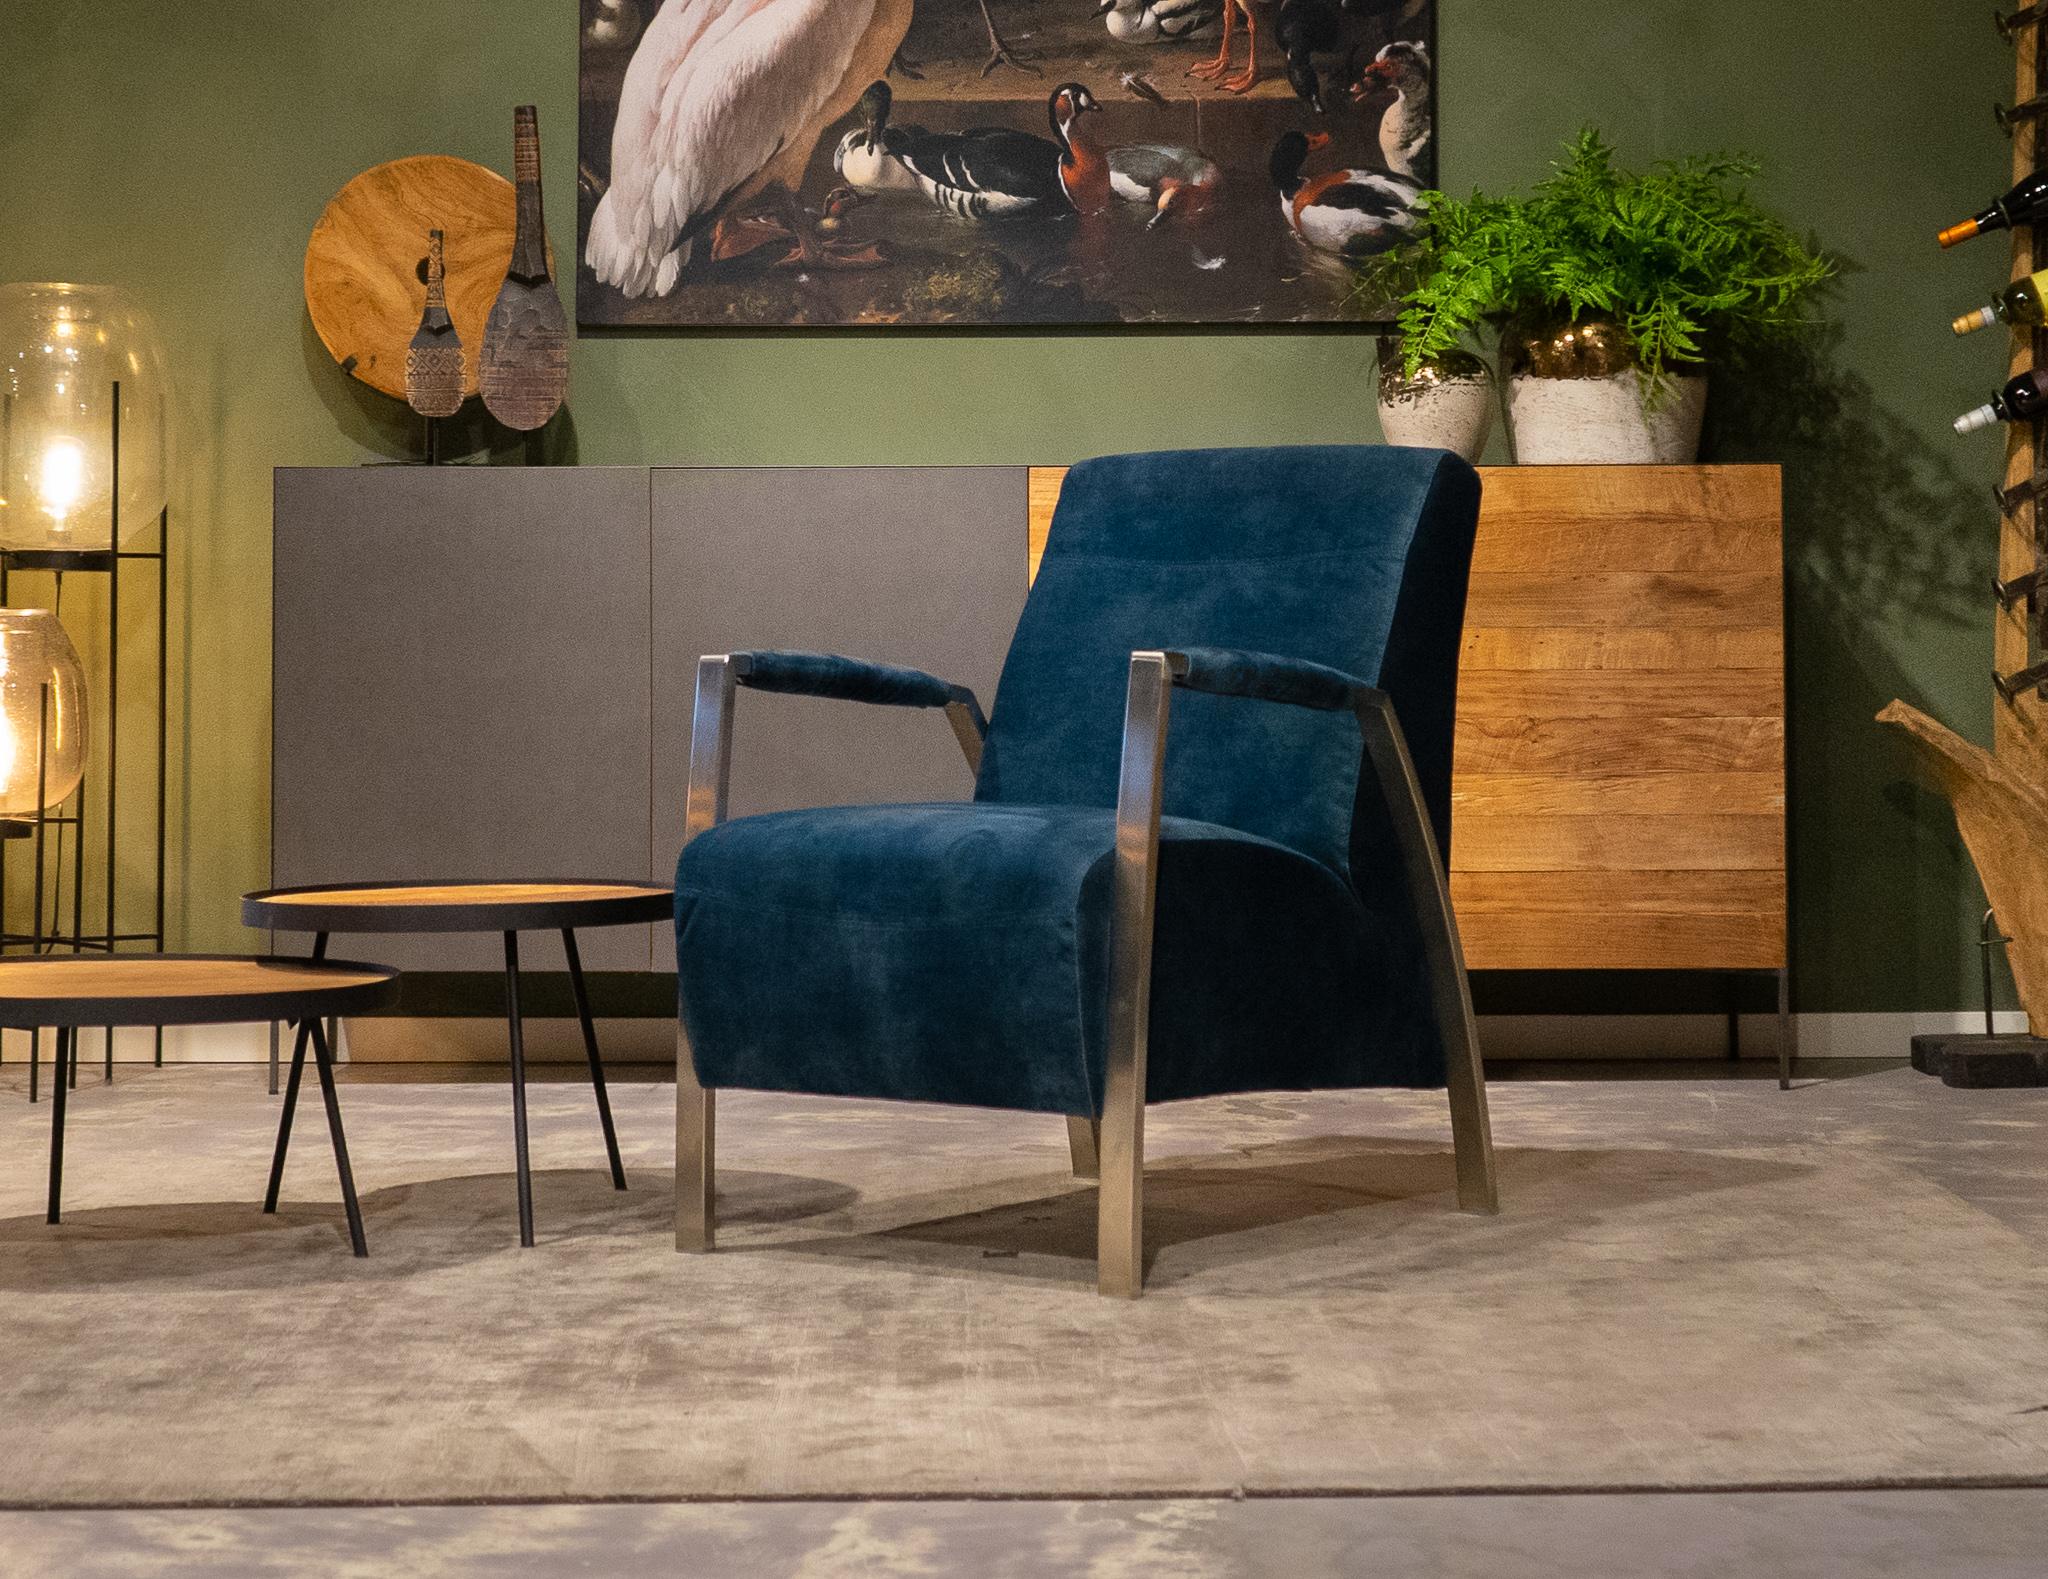 stoffen blauwe zetel